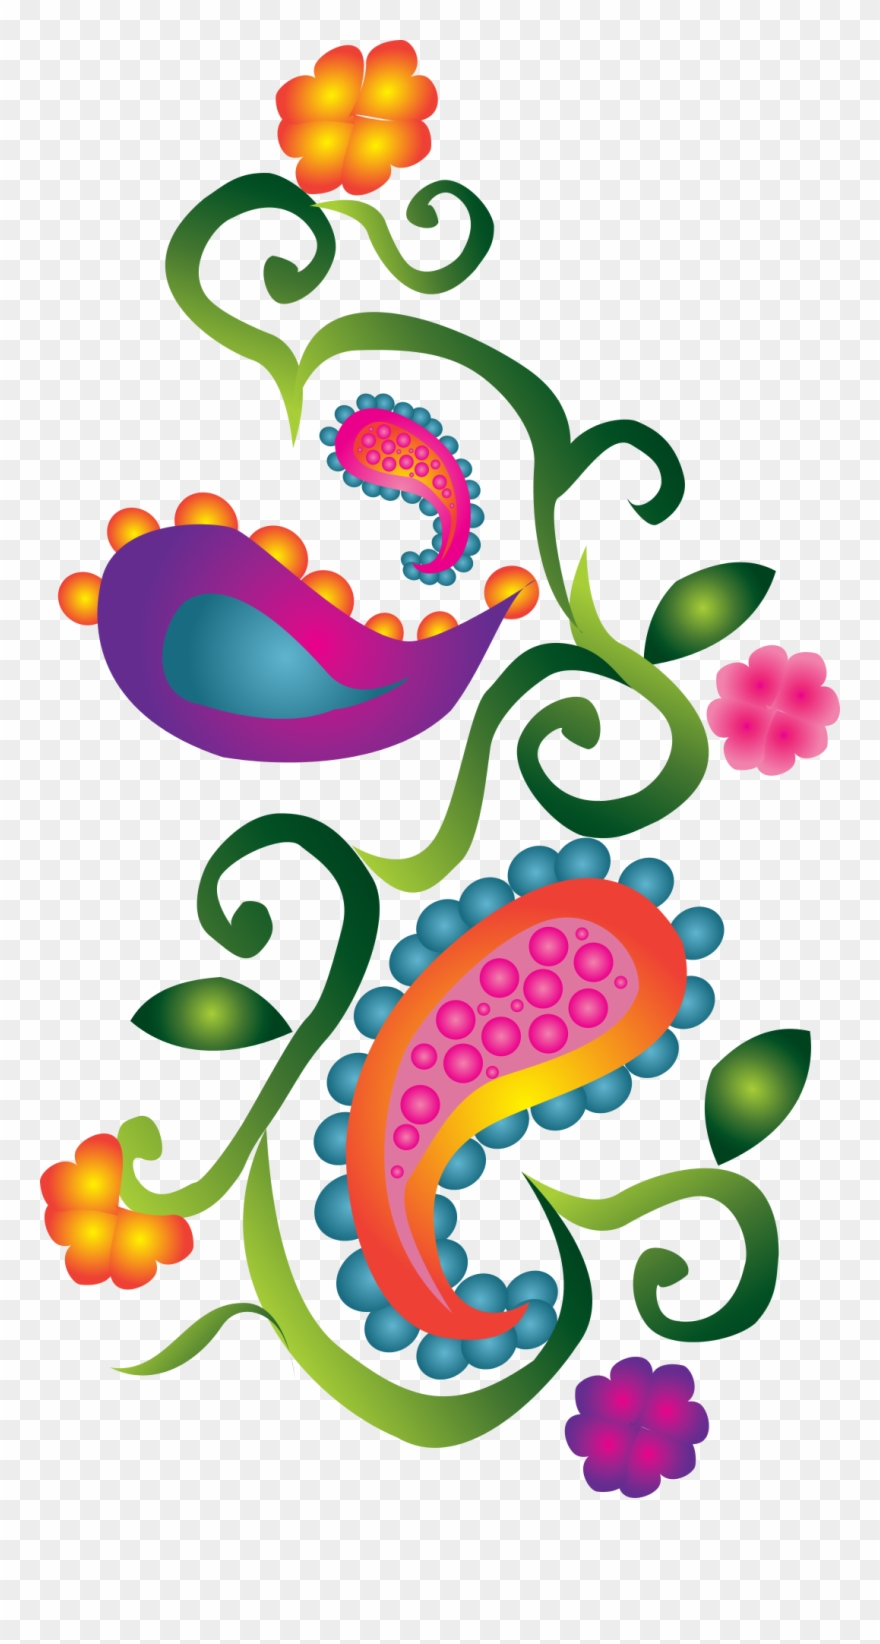 Decorative colorful note cards. Paisley clipart pretty design